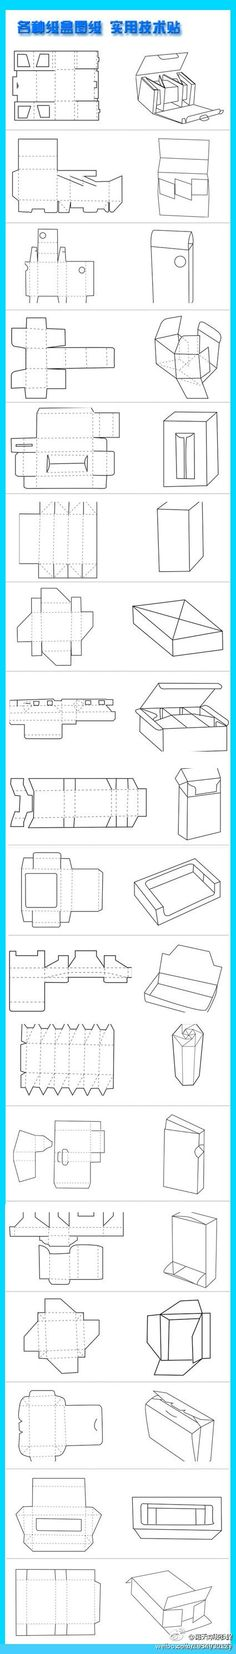 Dieline cut templates